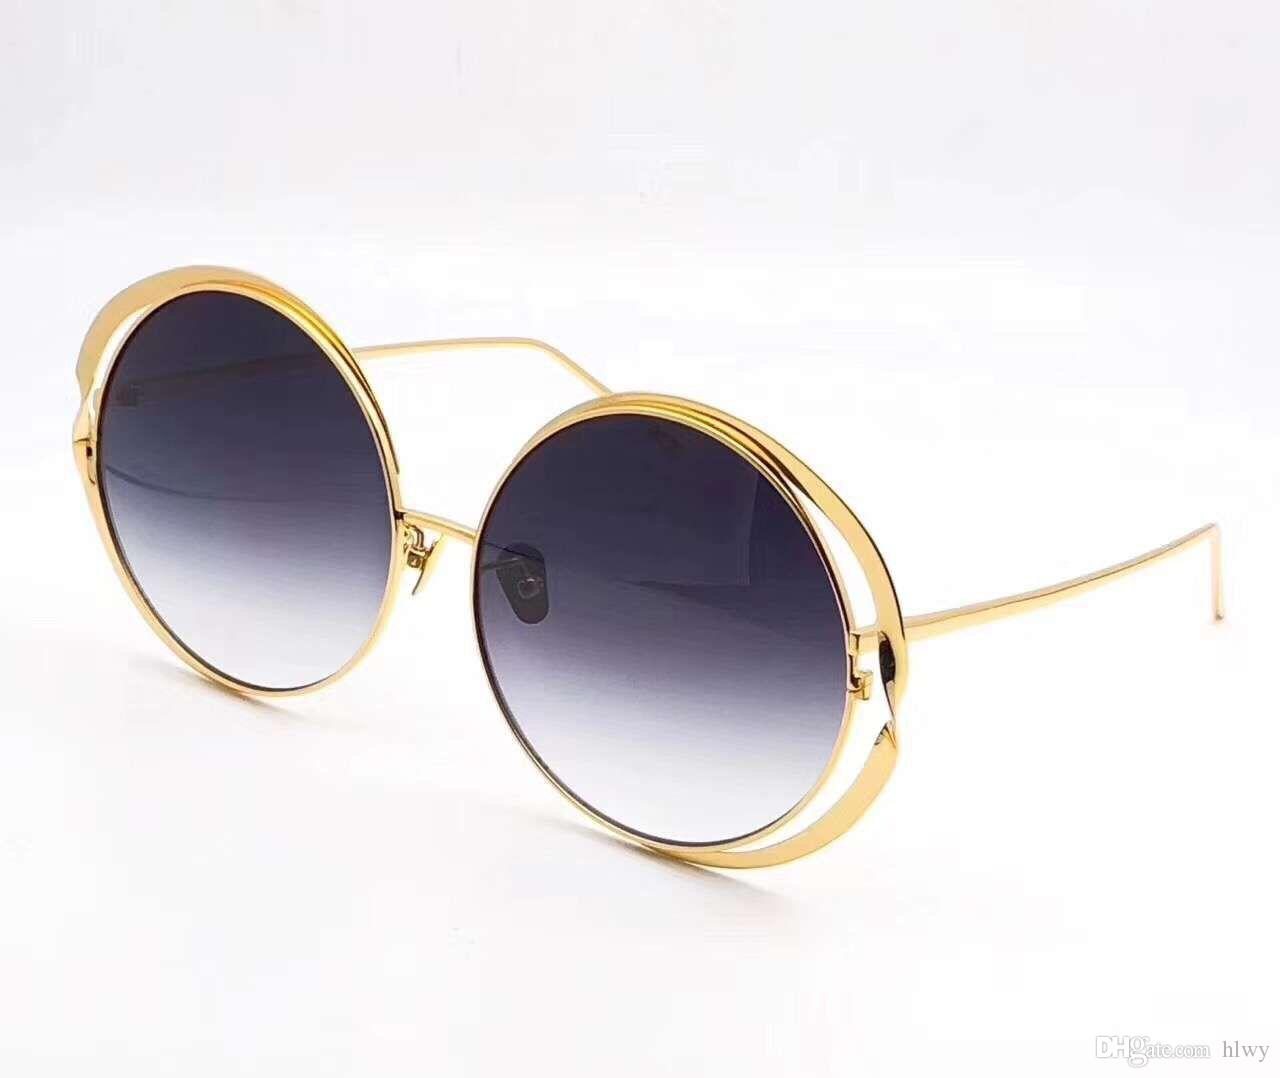 Linda Farrow Luxe LFL 659 Óculos De Sol Redondos Espelho de Ouro de Ouro 56mm Mulheres Designer de Marca de Óculos De Sol Novo caixa de sagacidade